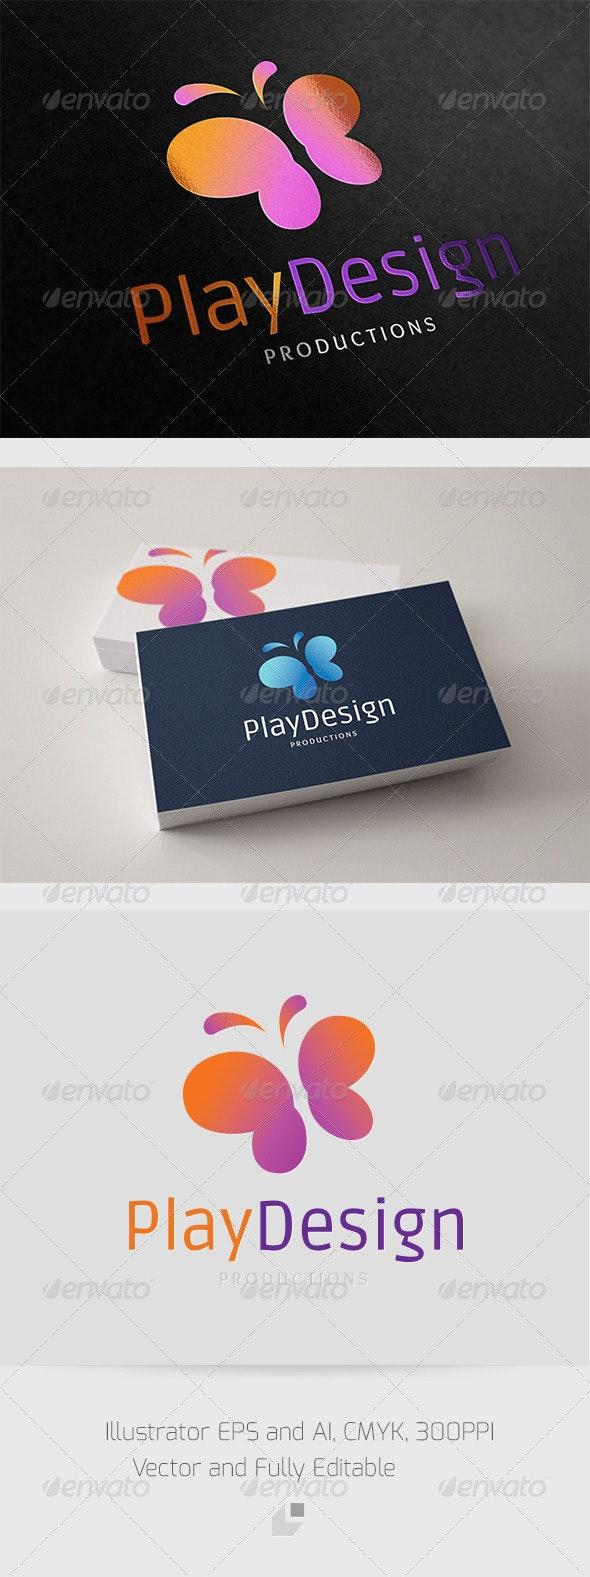 Play Design Logo - Animals Logo Templates